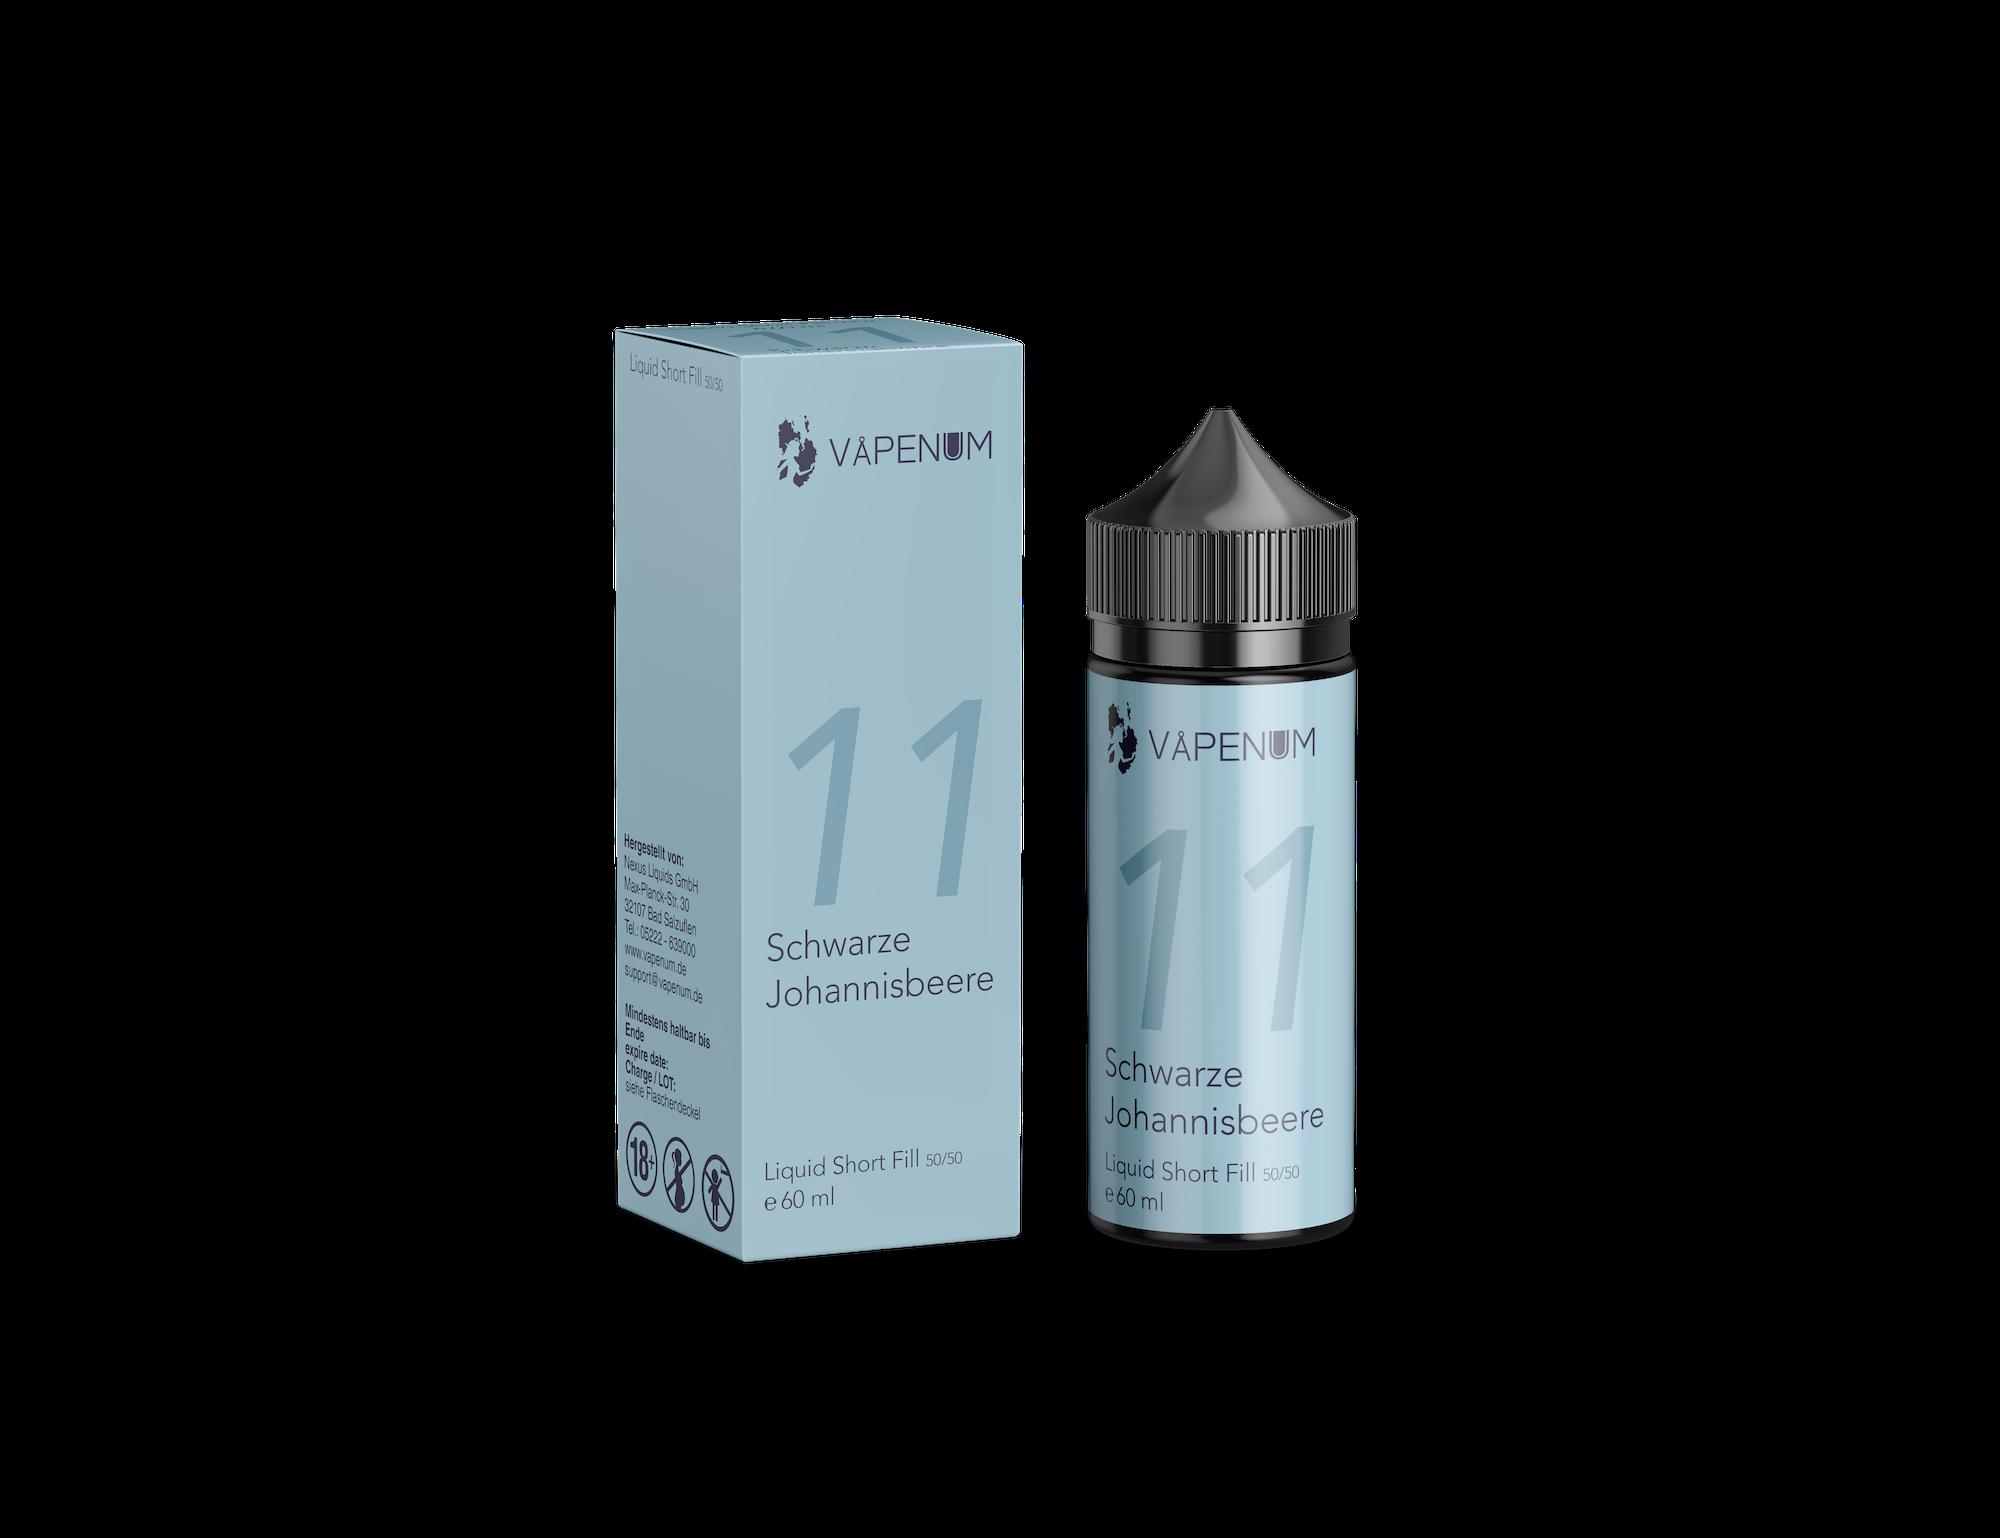 Vapenum Shortfill 11 - Schwarze Johannisbeere